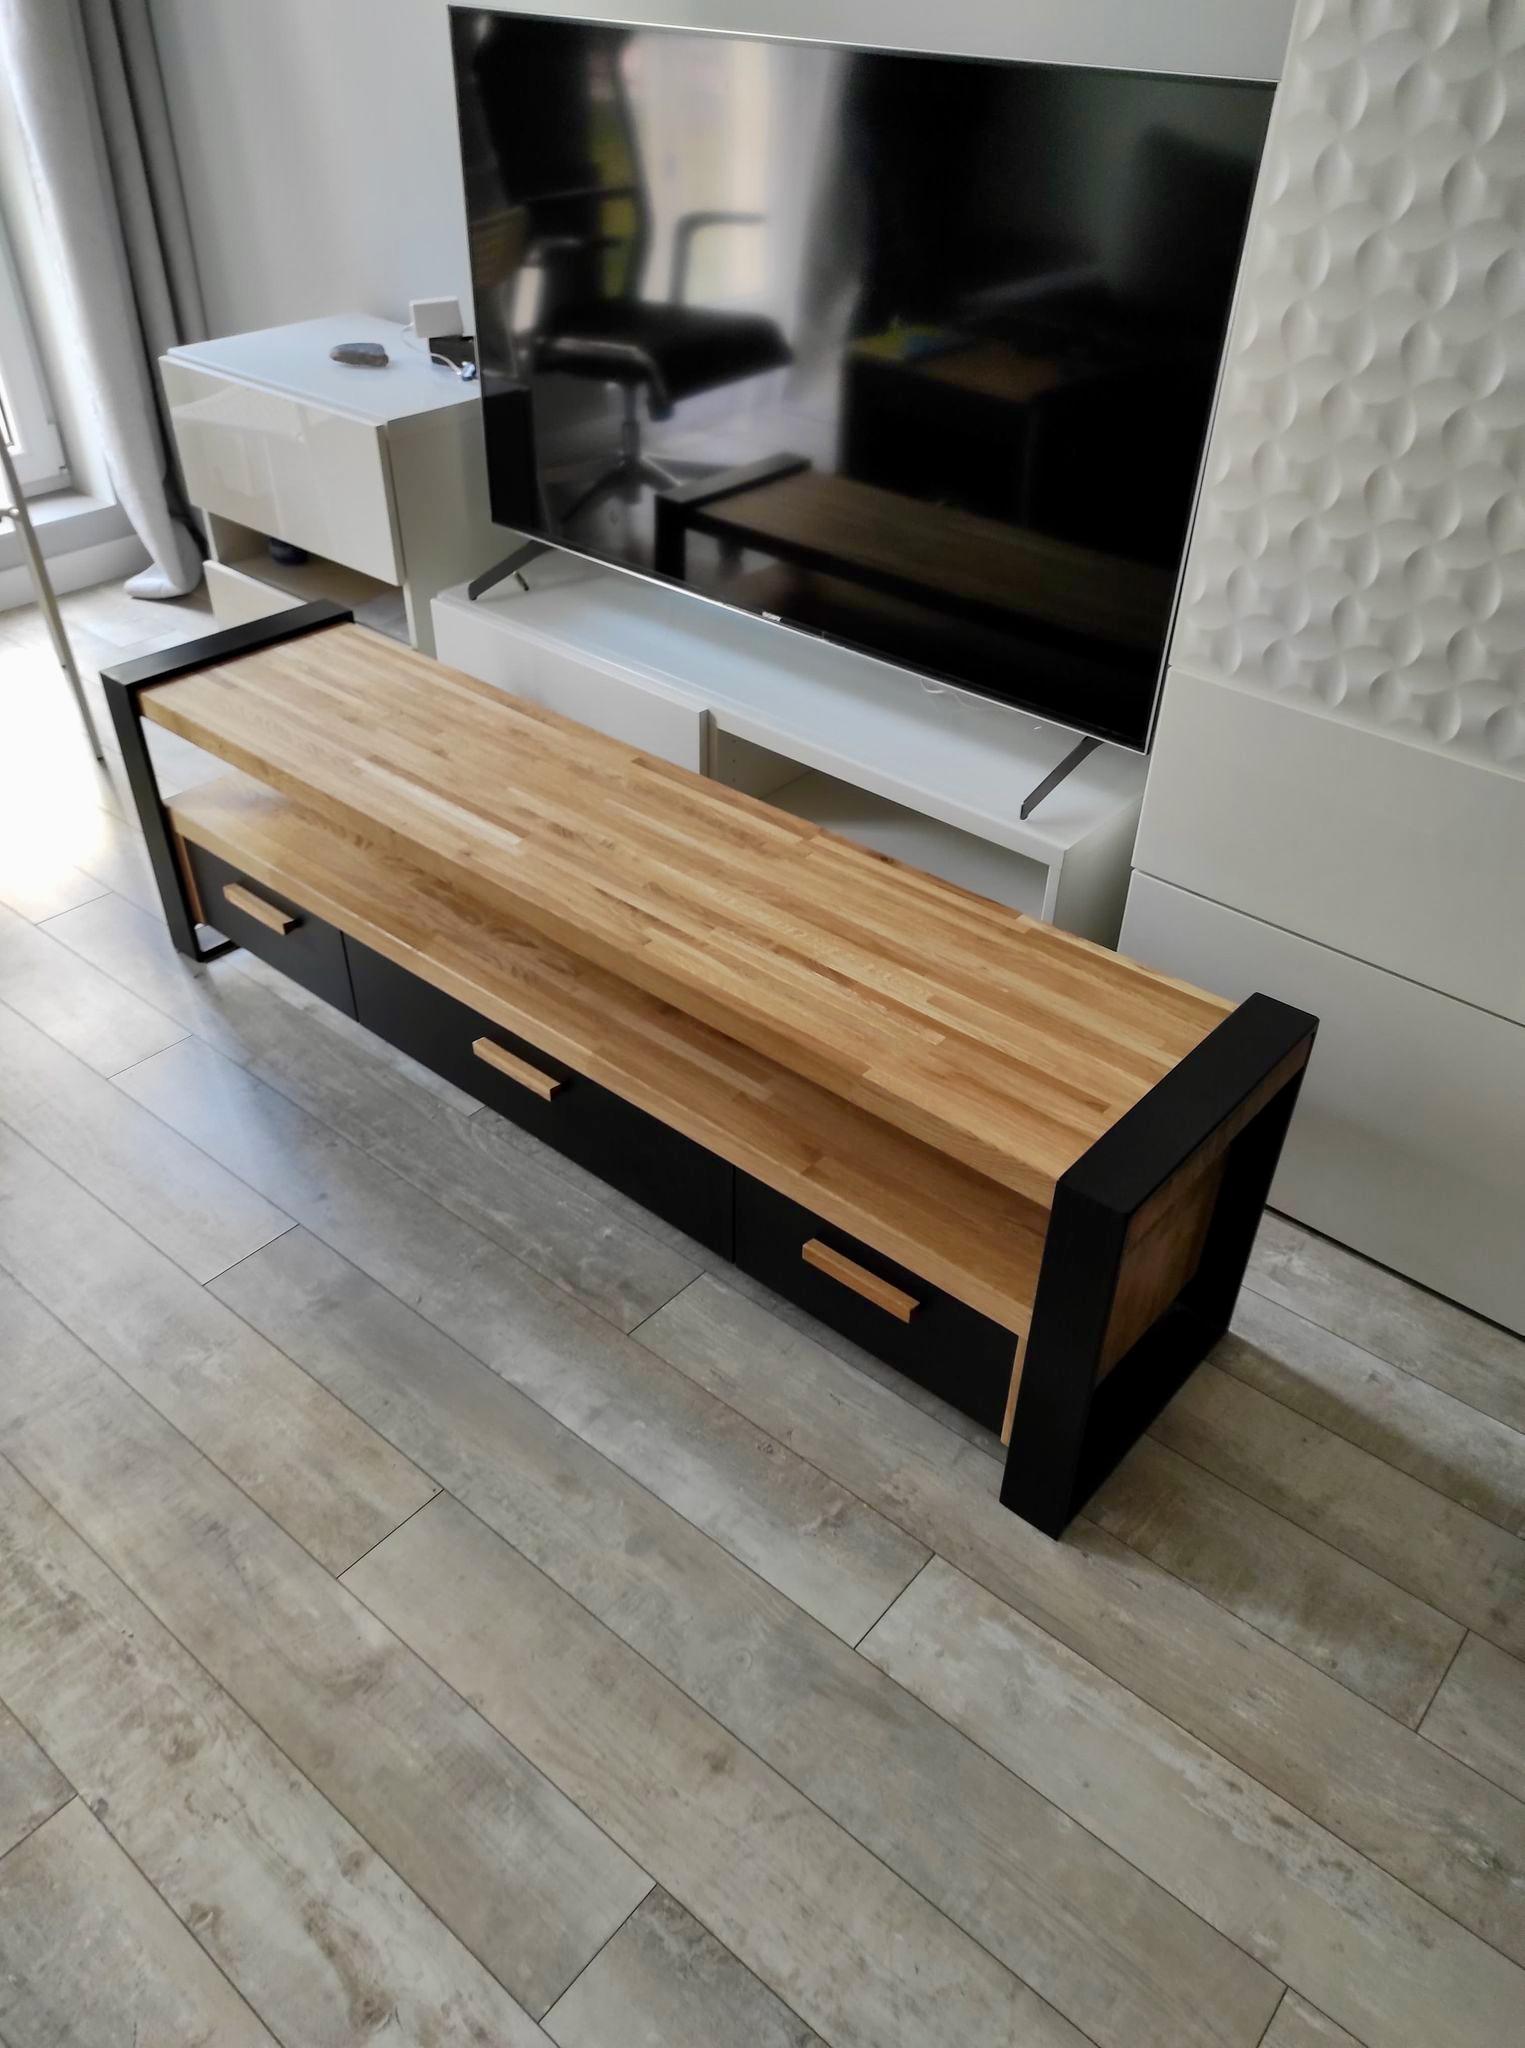 szafka rtv z drewna i metalu